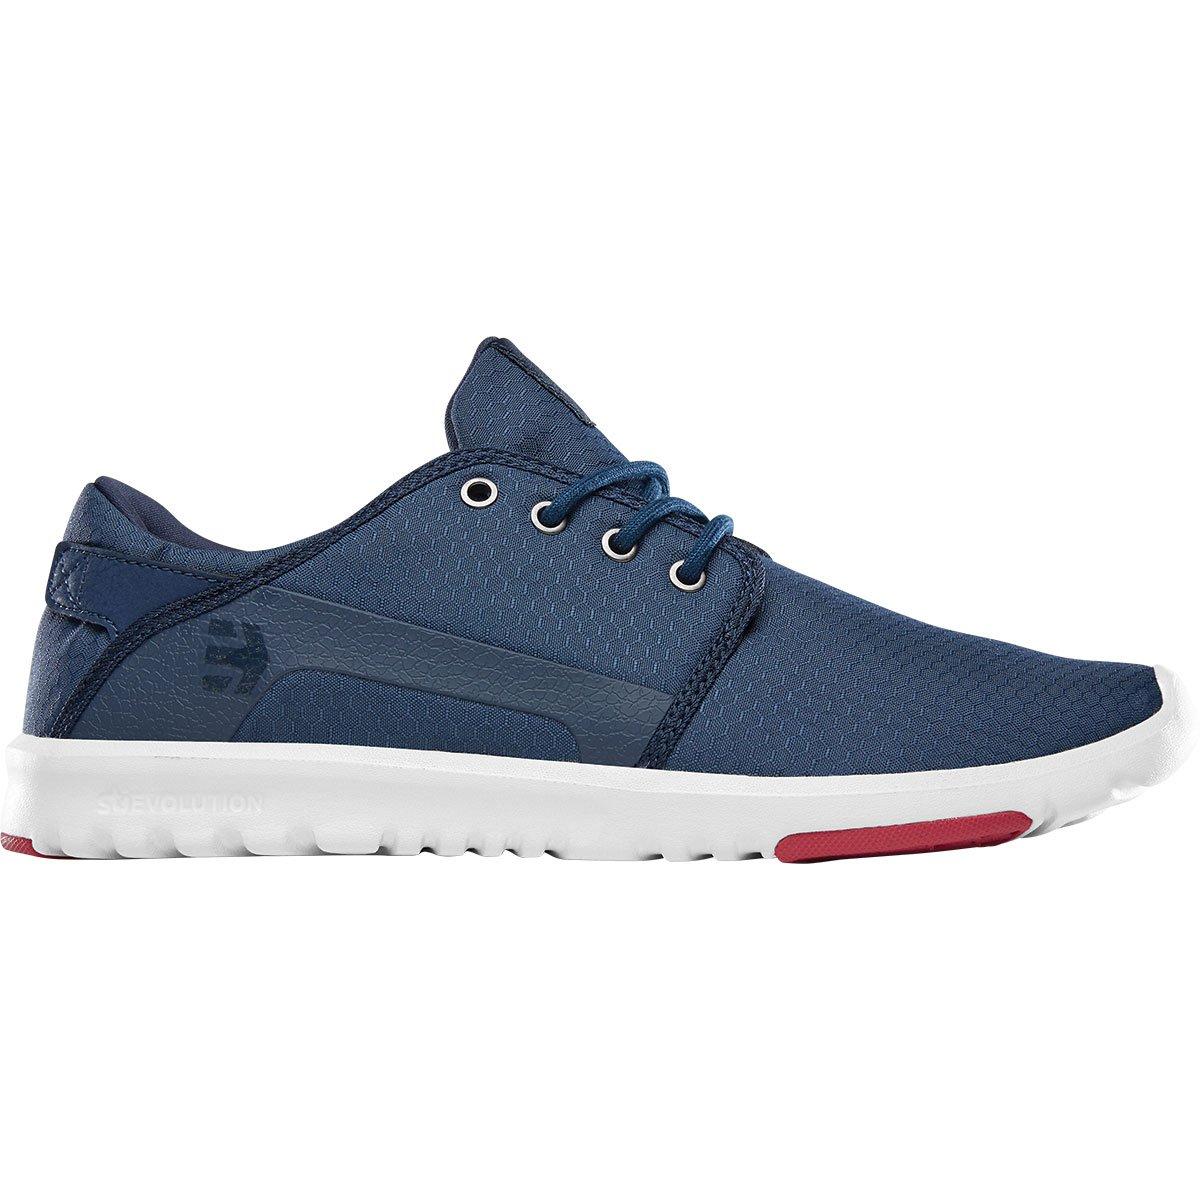 Etnies Men's Scout Skate Shoe 12 D(M) US|Dark Blue